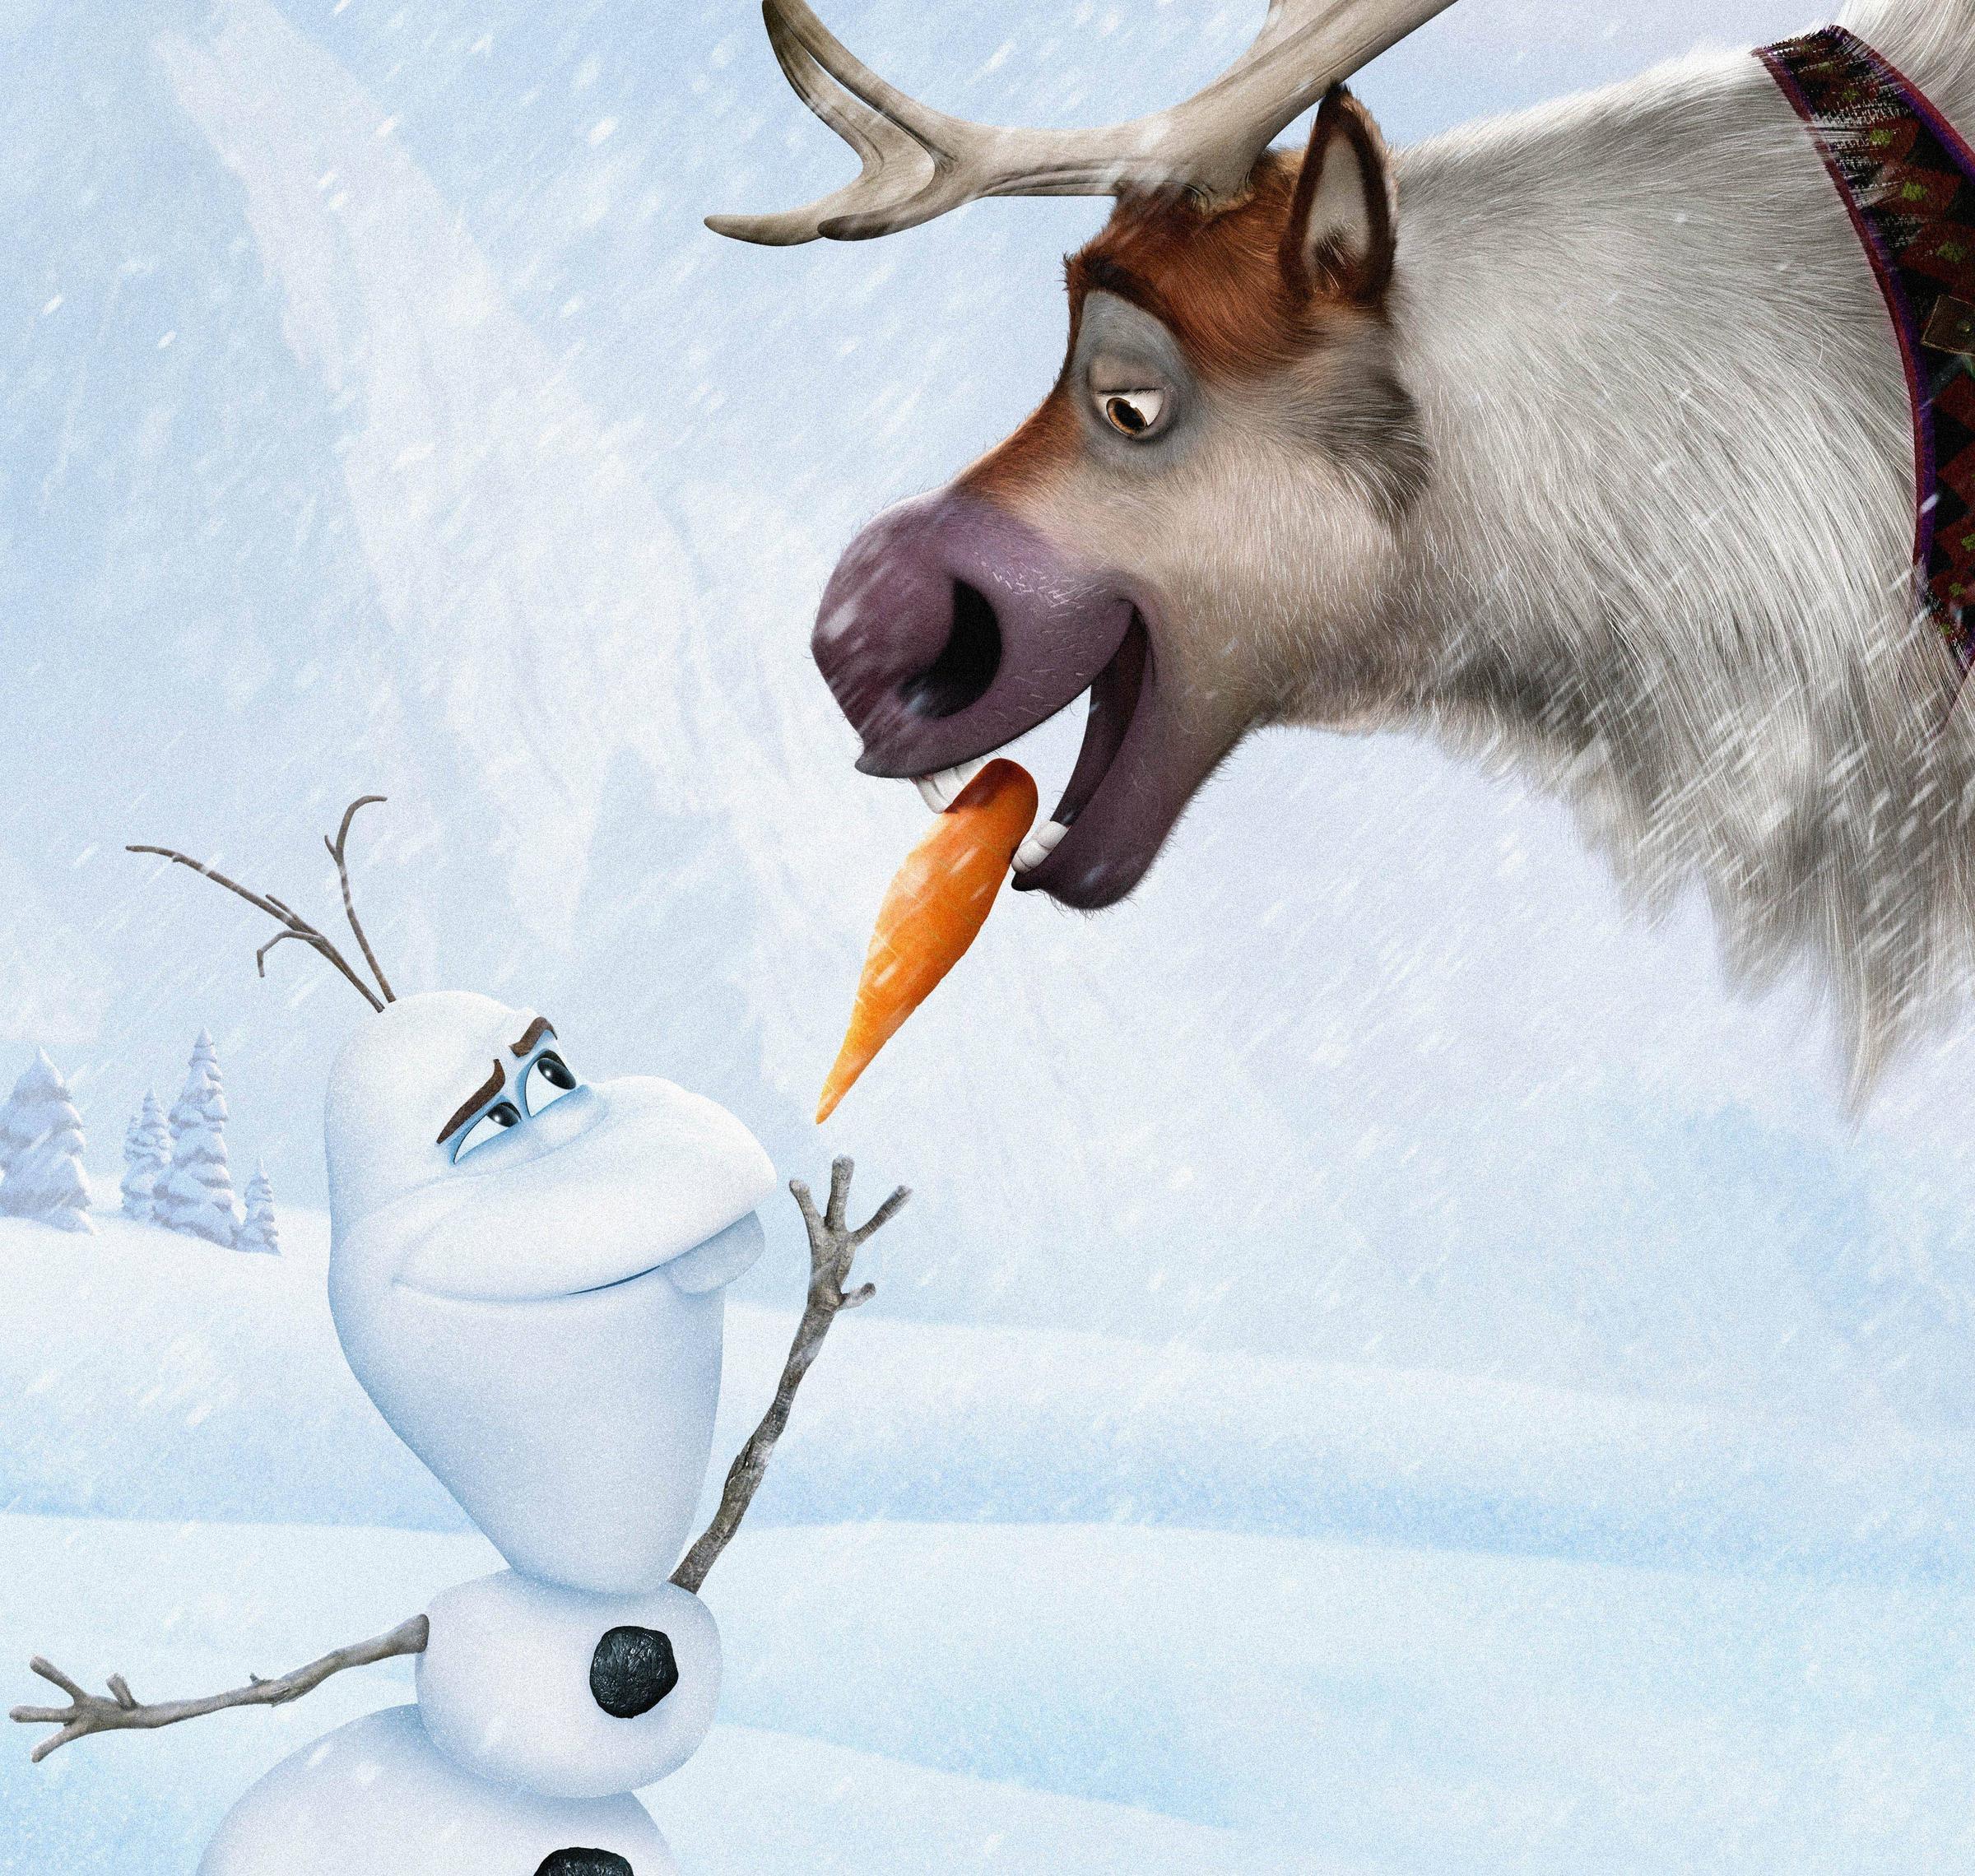 Olaf Wallpapers - Wallpaper Cave Disney Frozen Sven Wallpaper